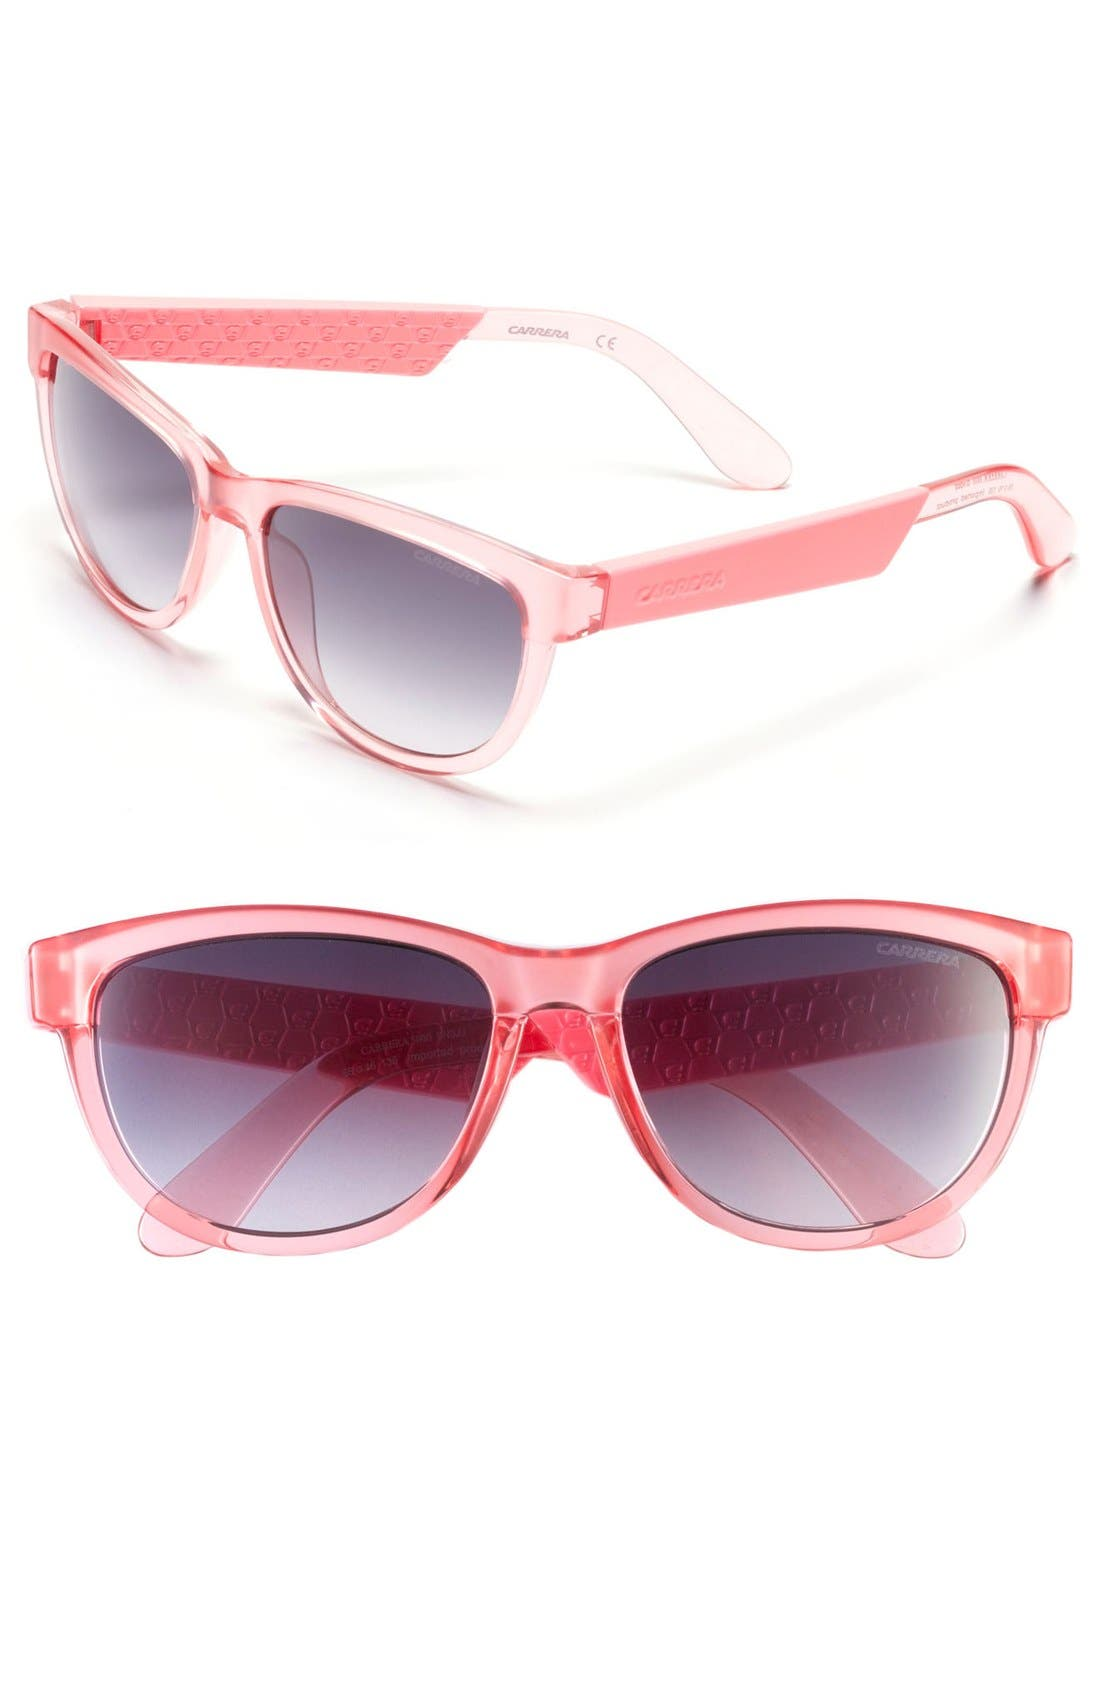 55mm Sunglasses,                             Main thumbnail 1, color,                             Pink